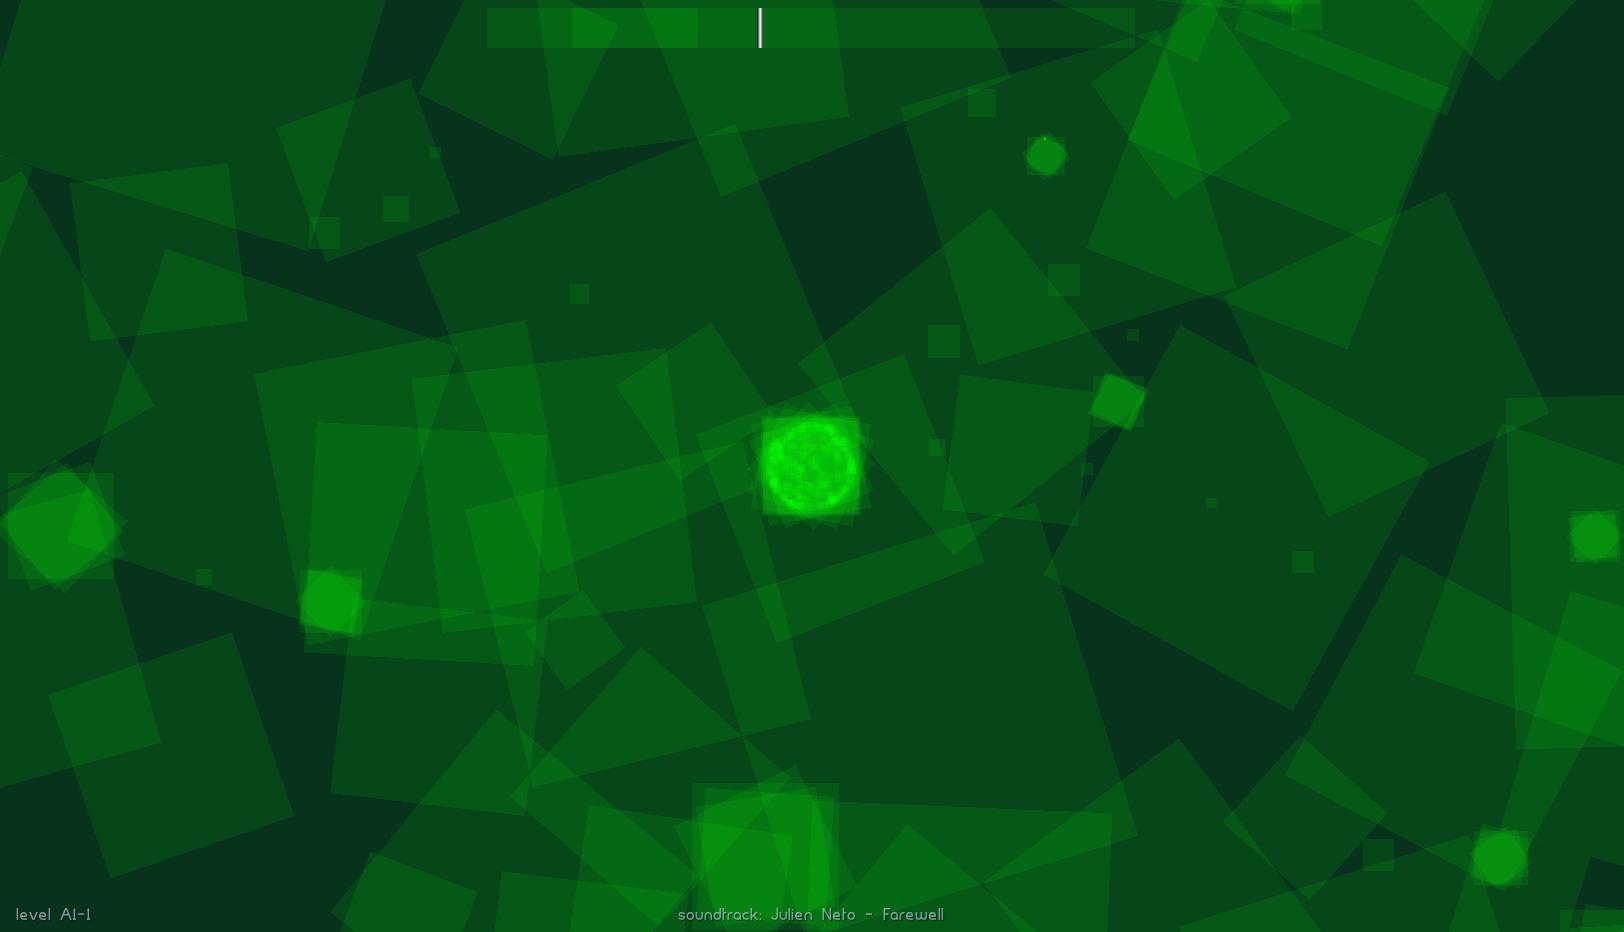 Intelligent distribution causes far less overlap than random placement.